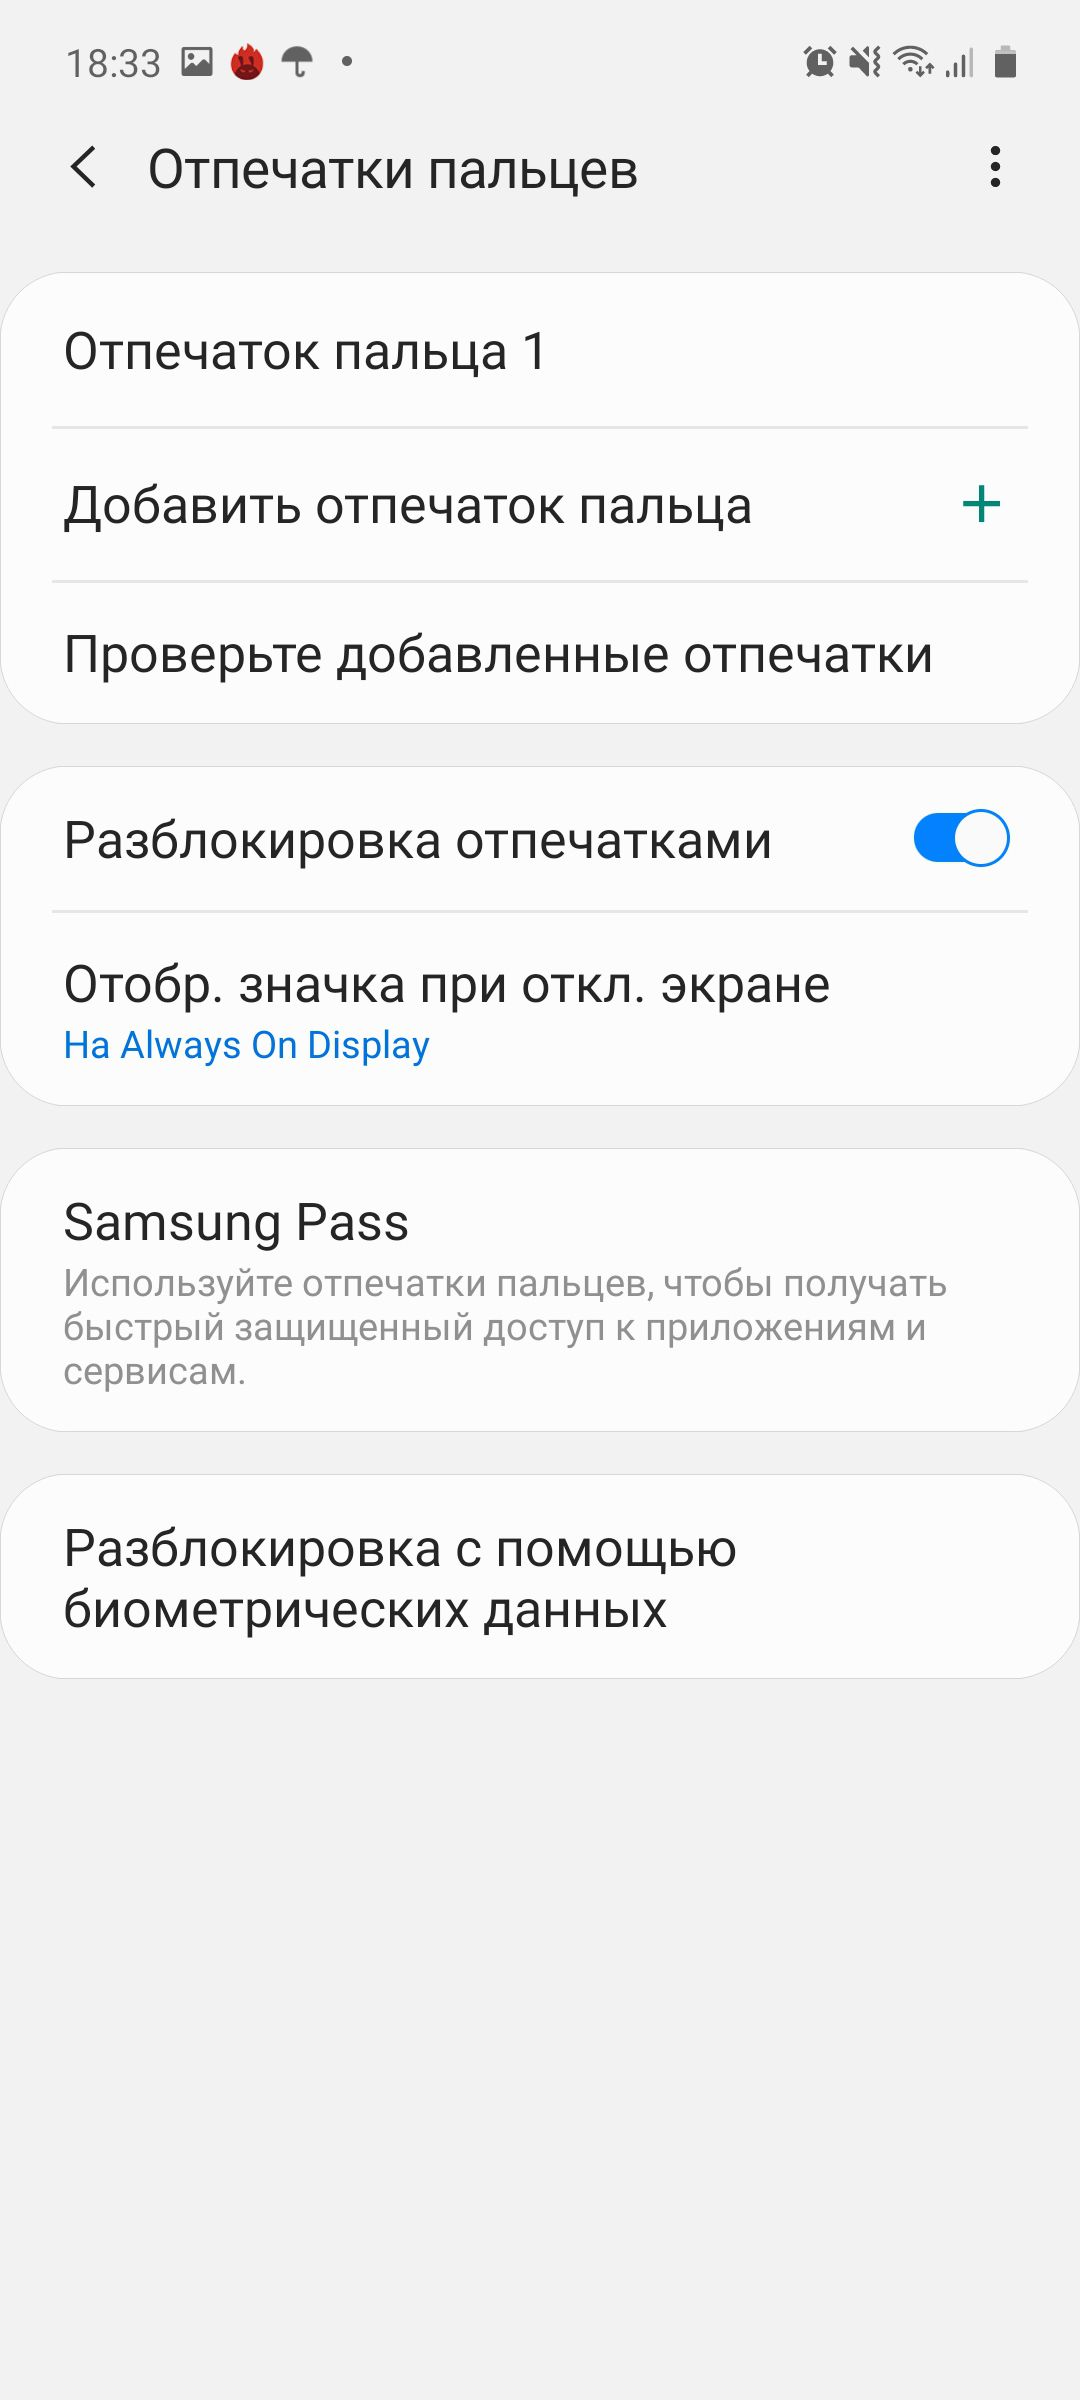 Обзор Samsung Galaxy A71: завышенный середнячок Samsung  - obzor_samsung_galaxy_a71_overprajsnutyj_serednak_picture67_2